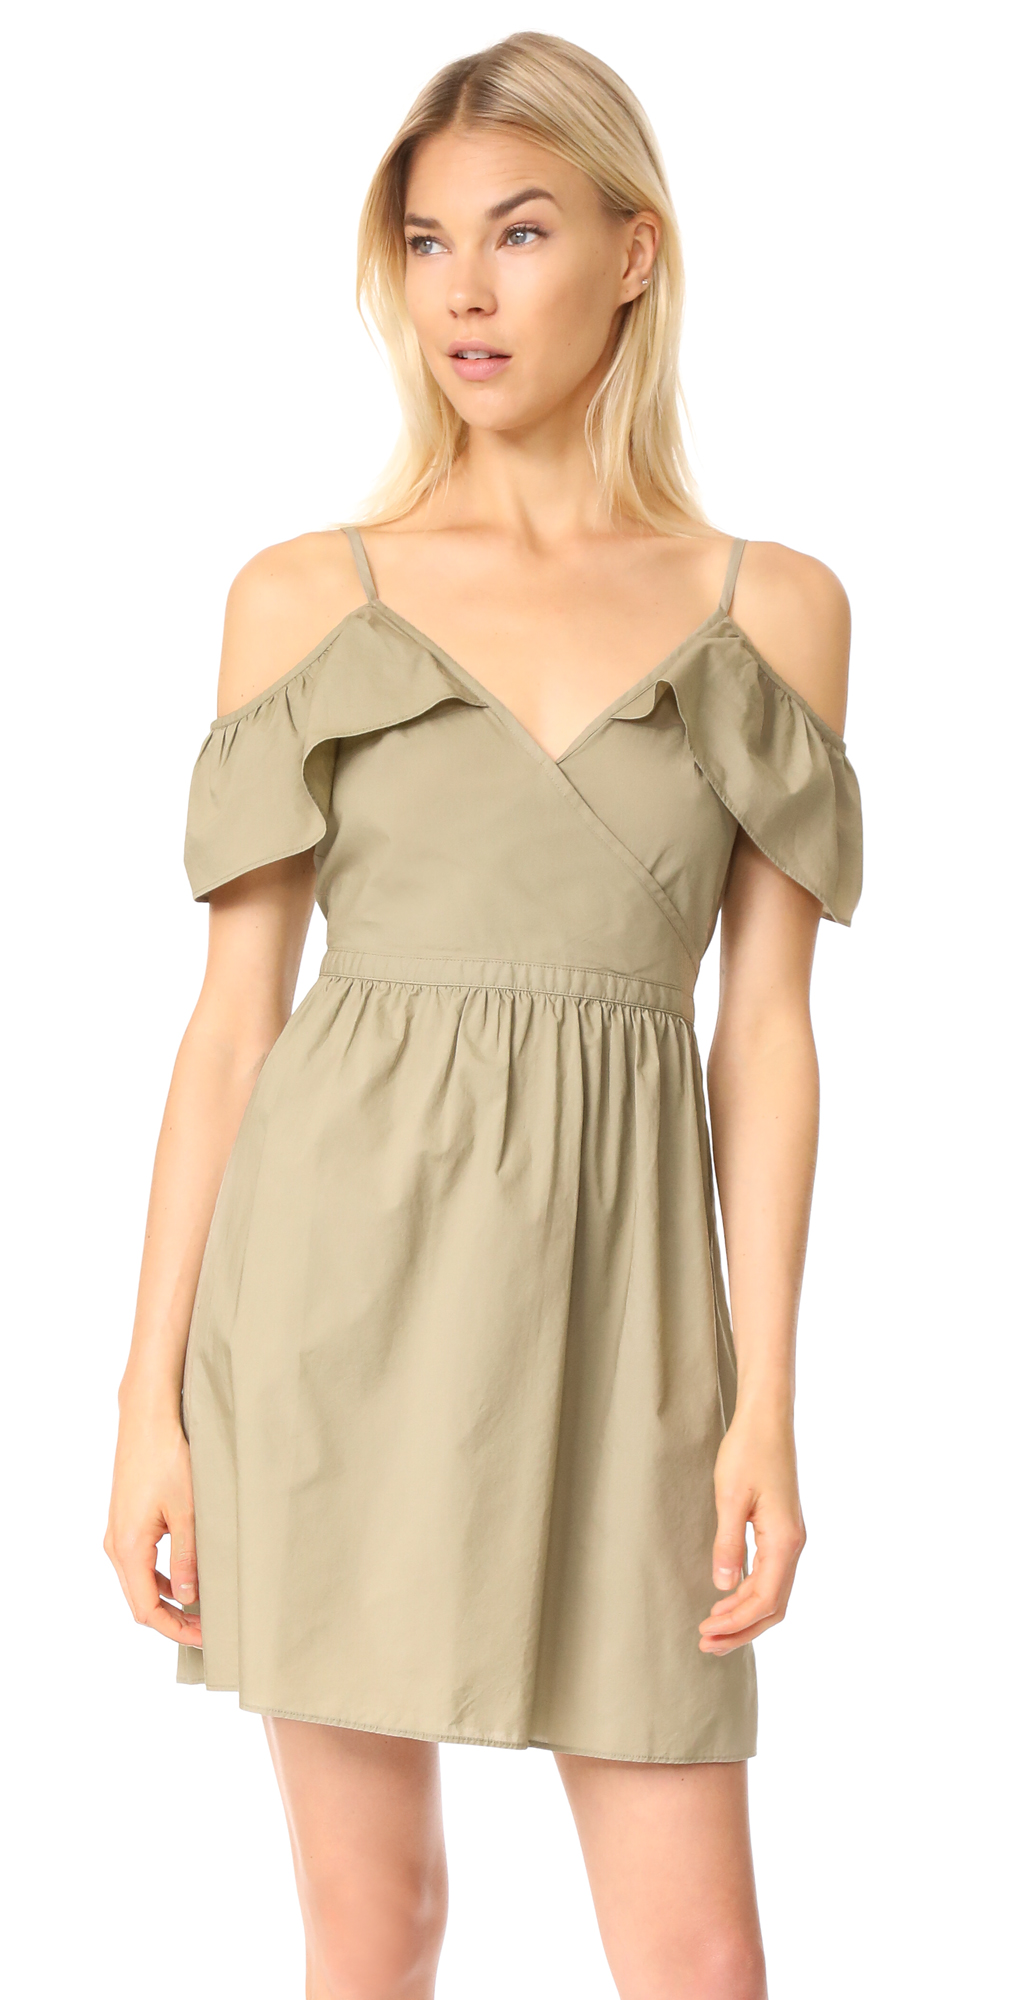 Khaki Cold Shoulder Dress Madewell